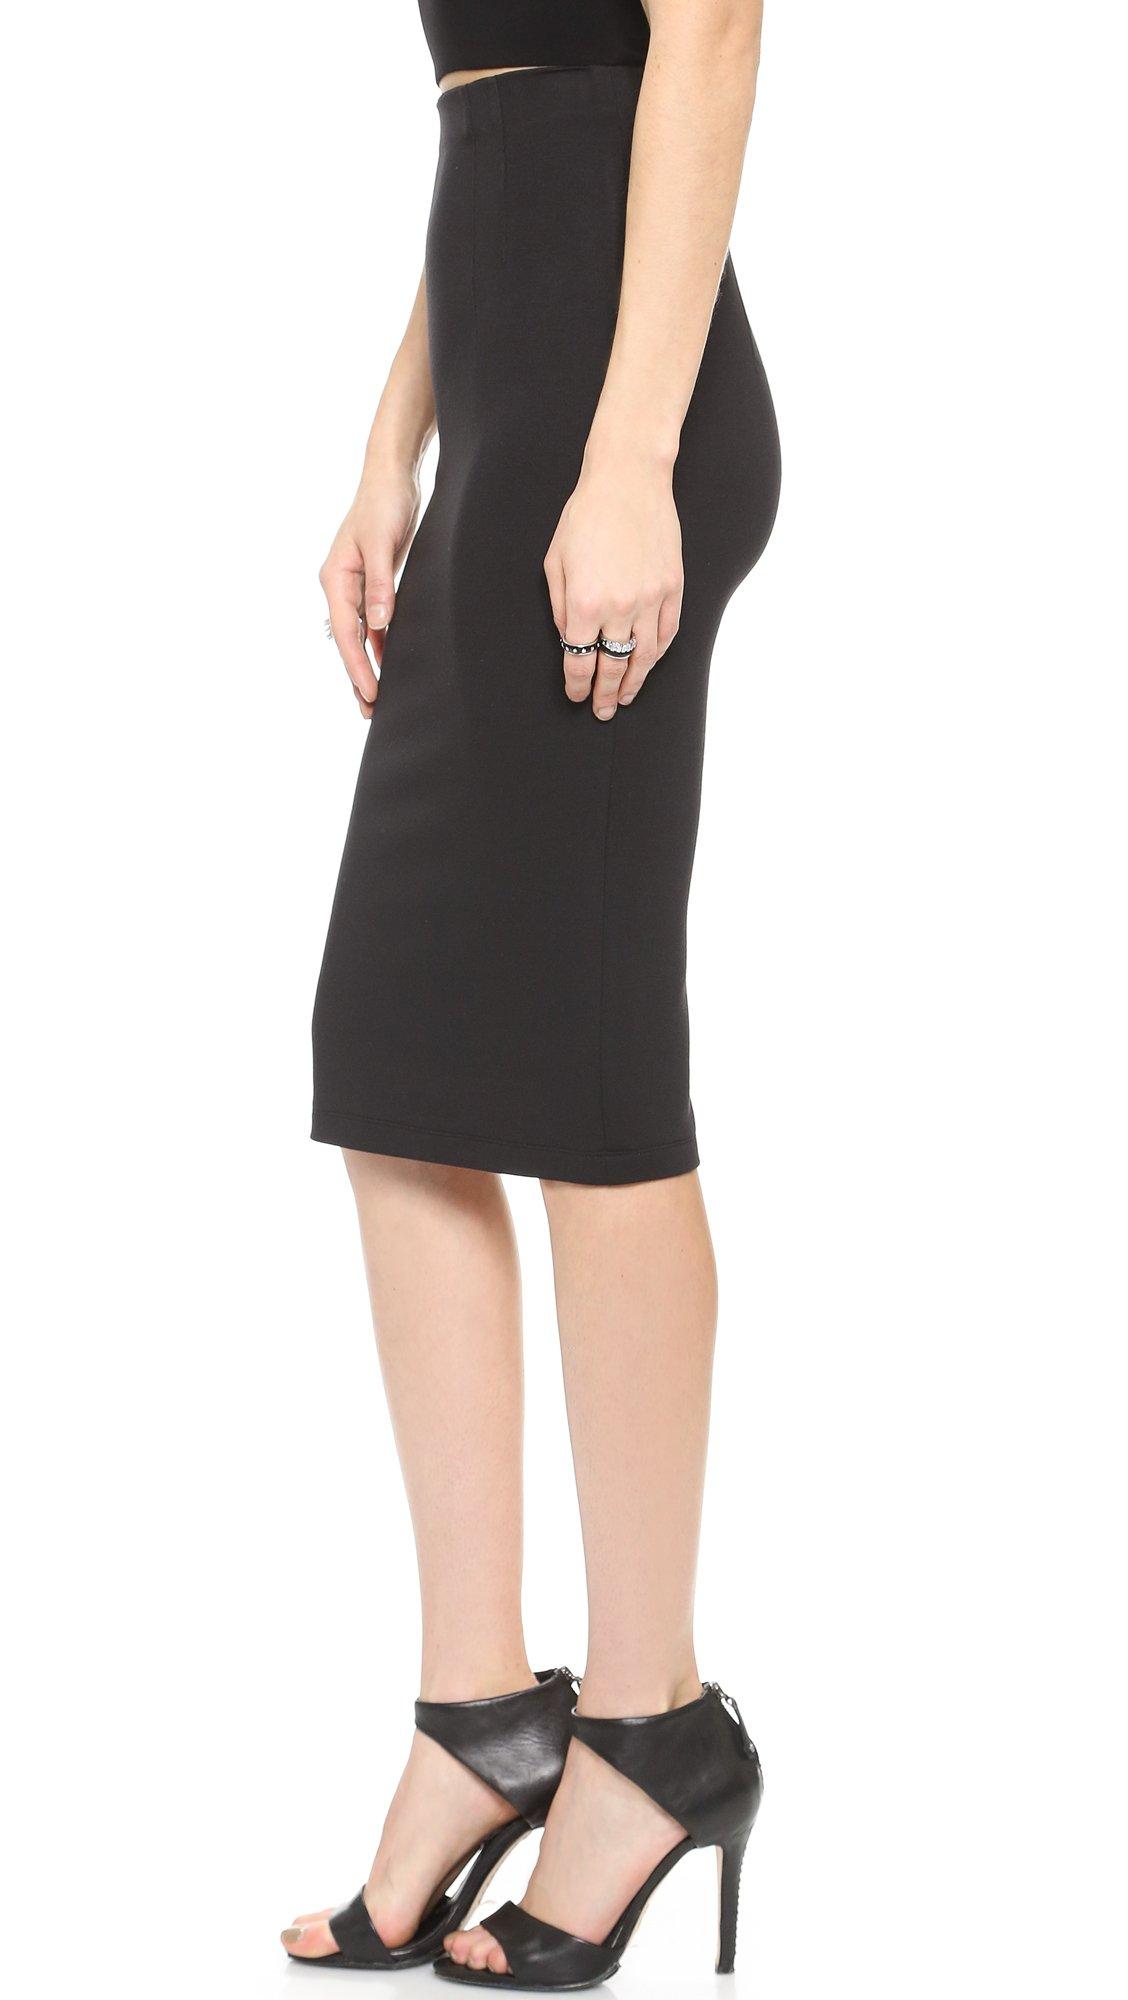 Alice   olivia Super High Waist Pencil Skirt - Black in Black | Lyst